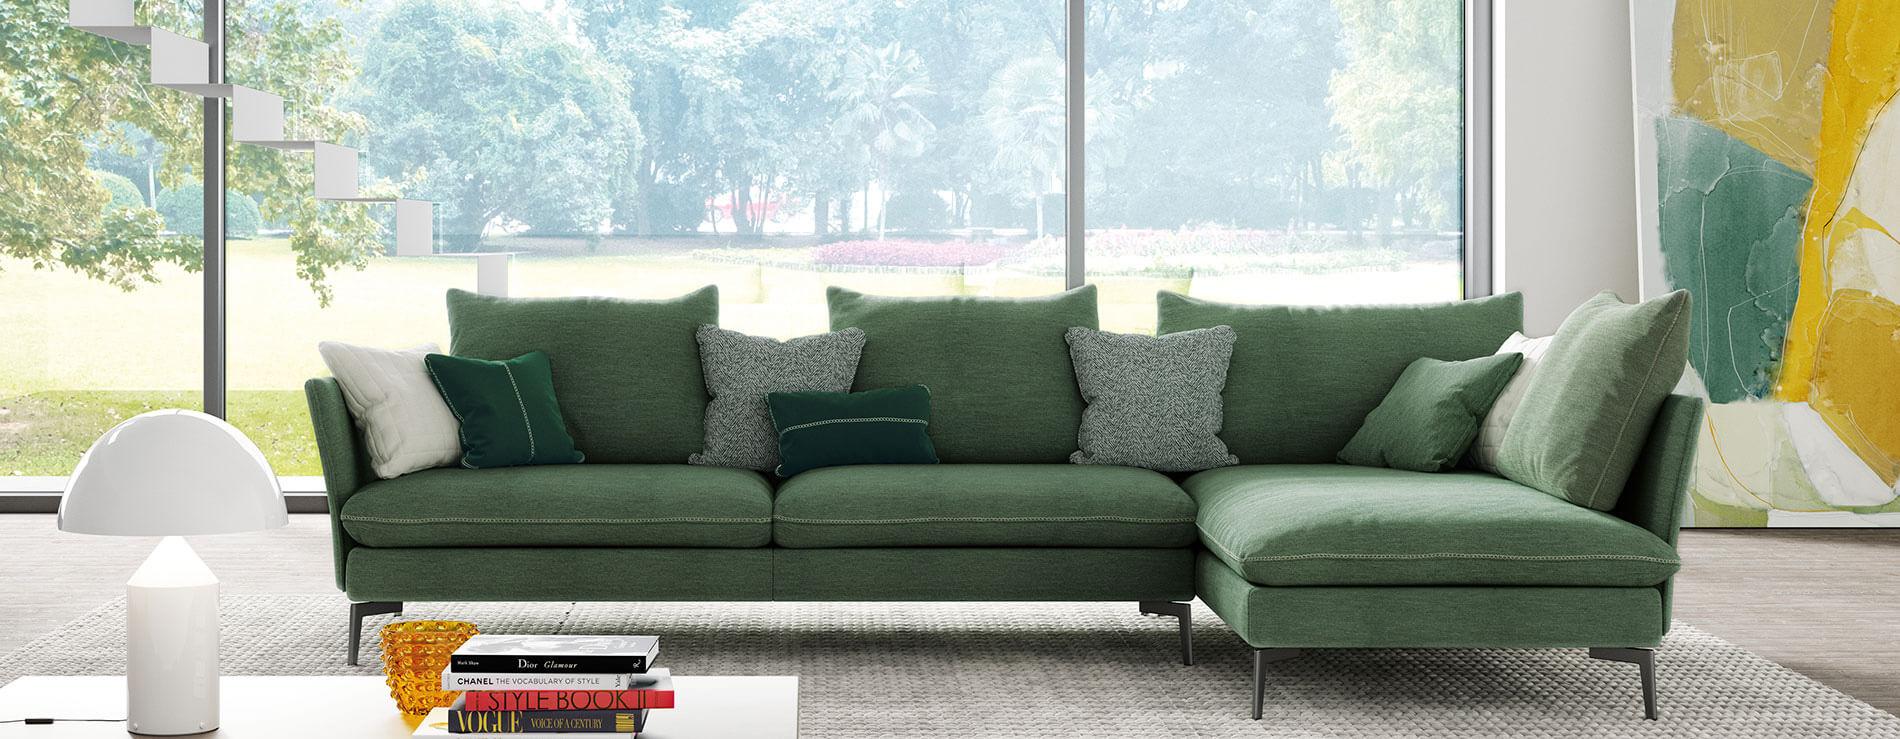 divano link biba